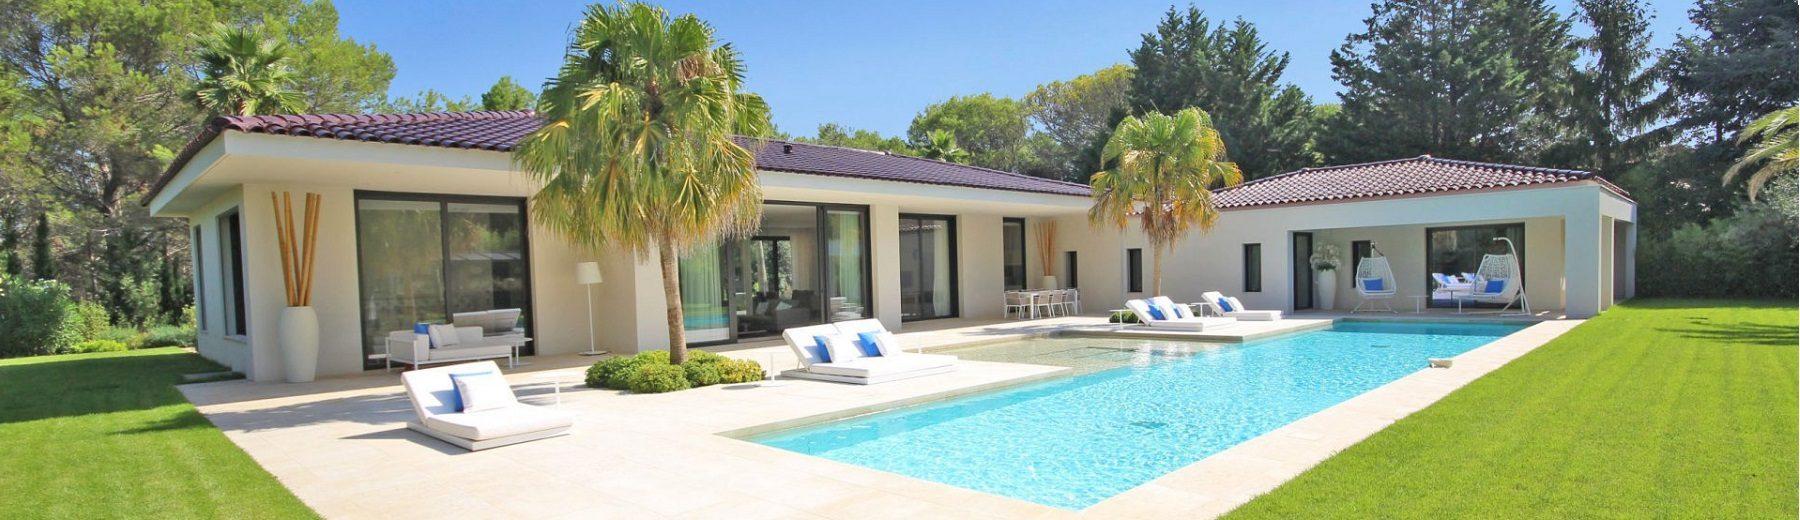 Marilyn Lukas Real Estate